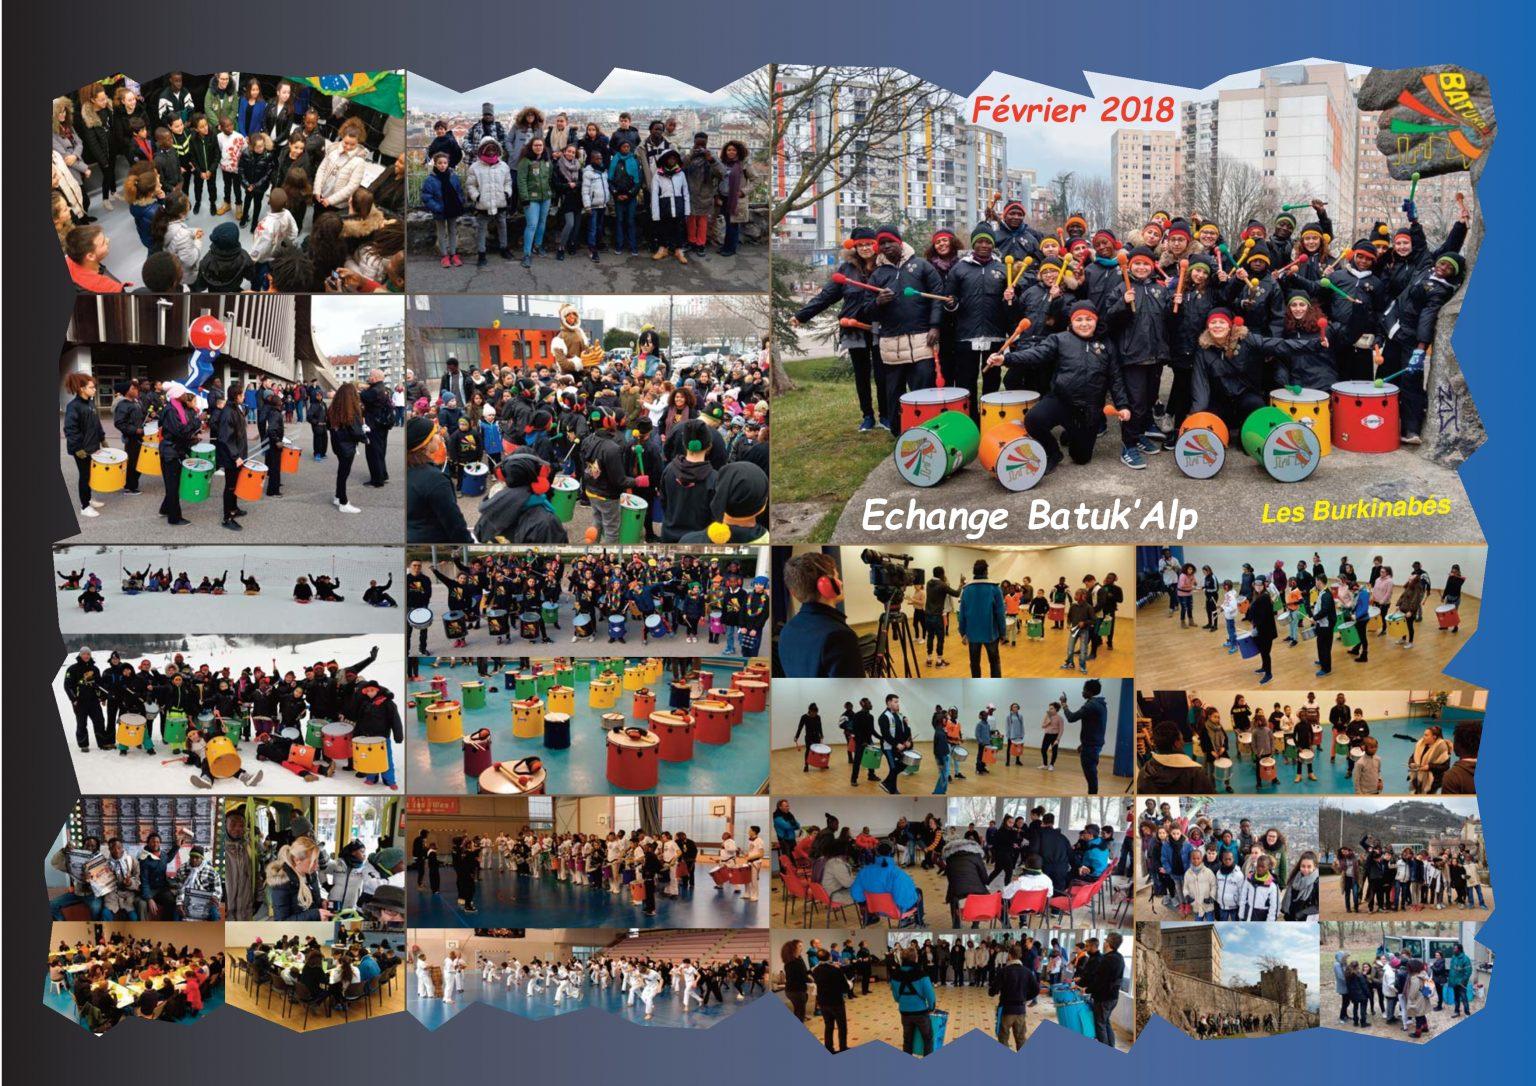 BatukaVI - Panneau Photos 2018-02 Echange Batuk'Alp - Les Burkinabés